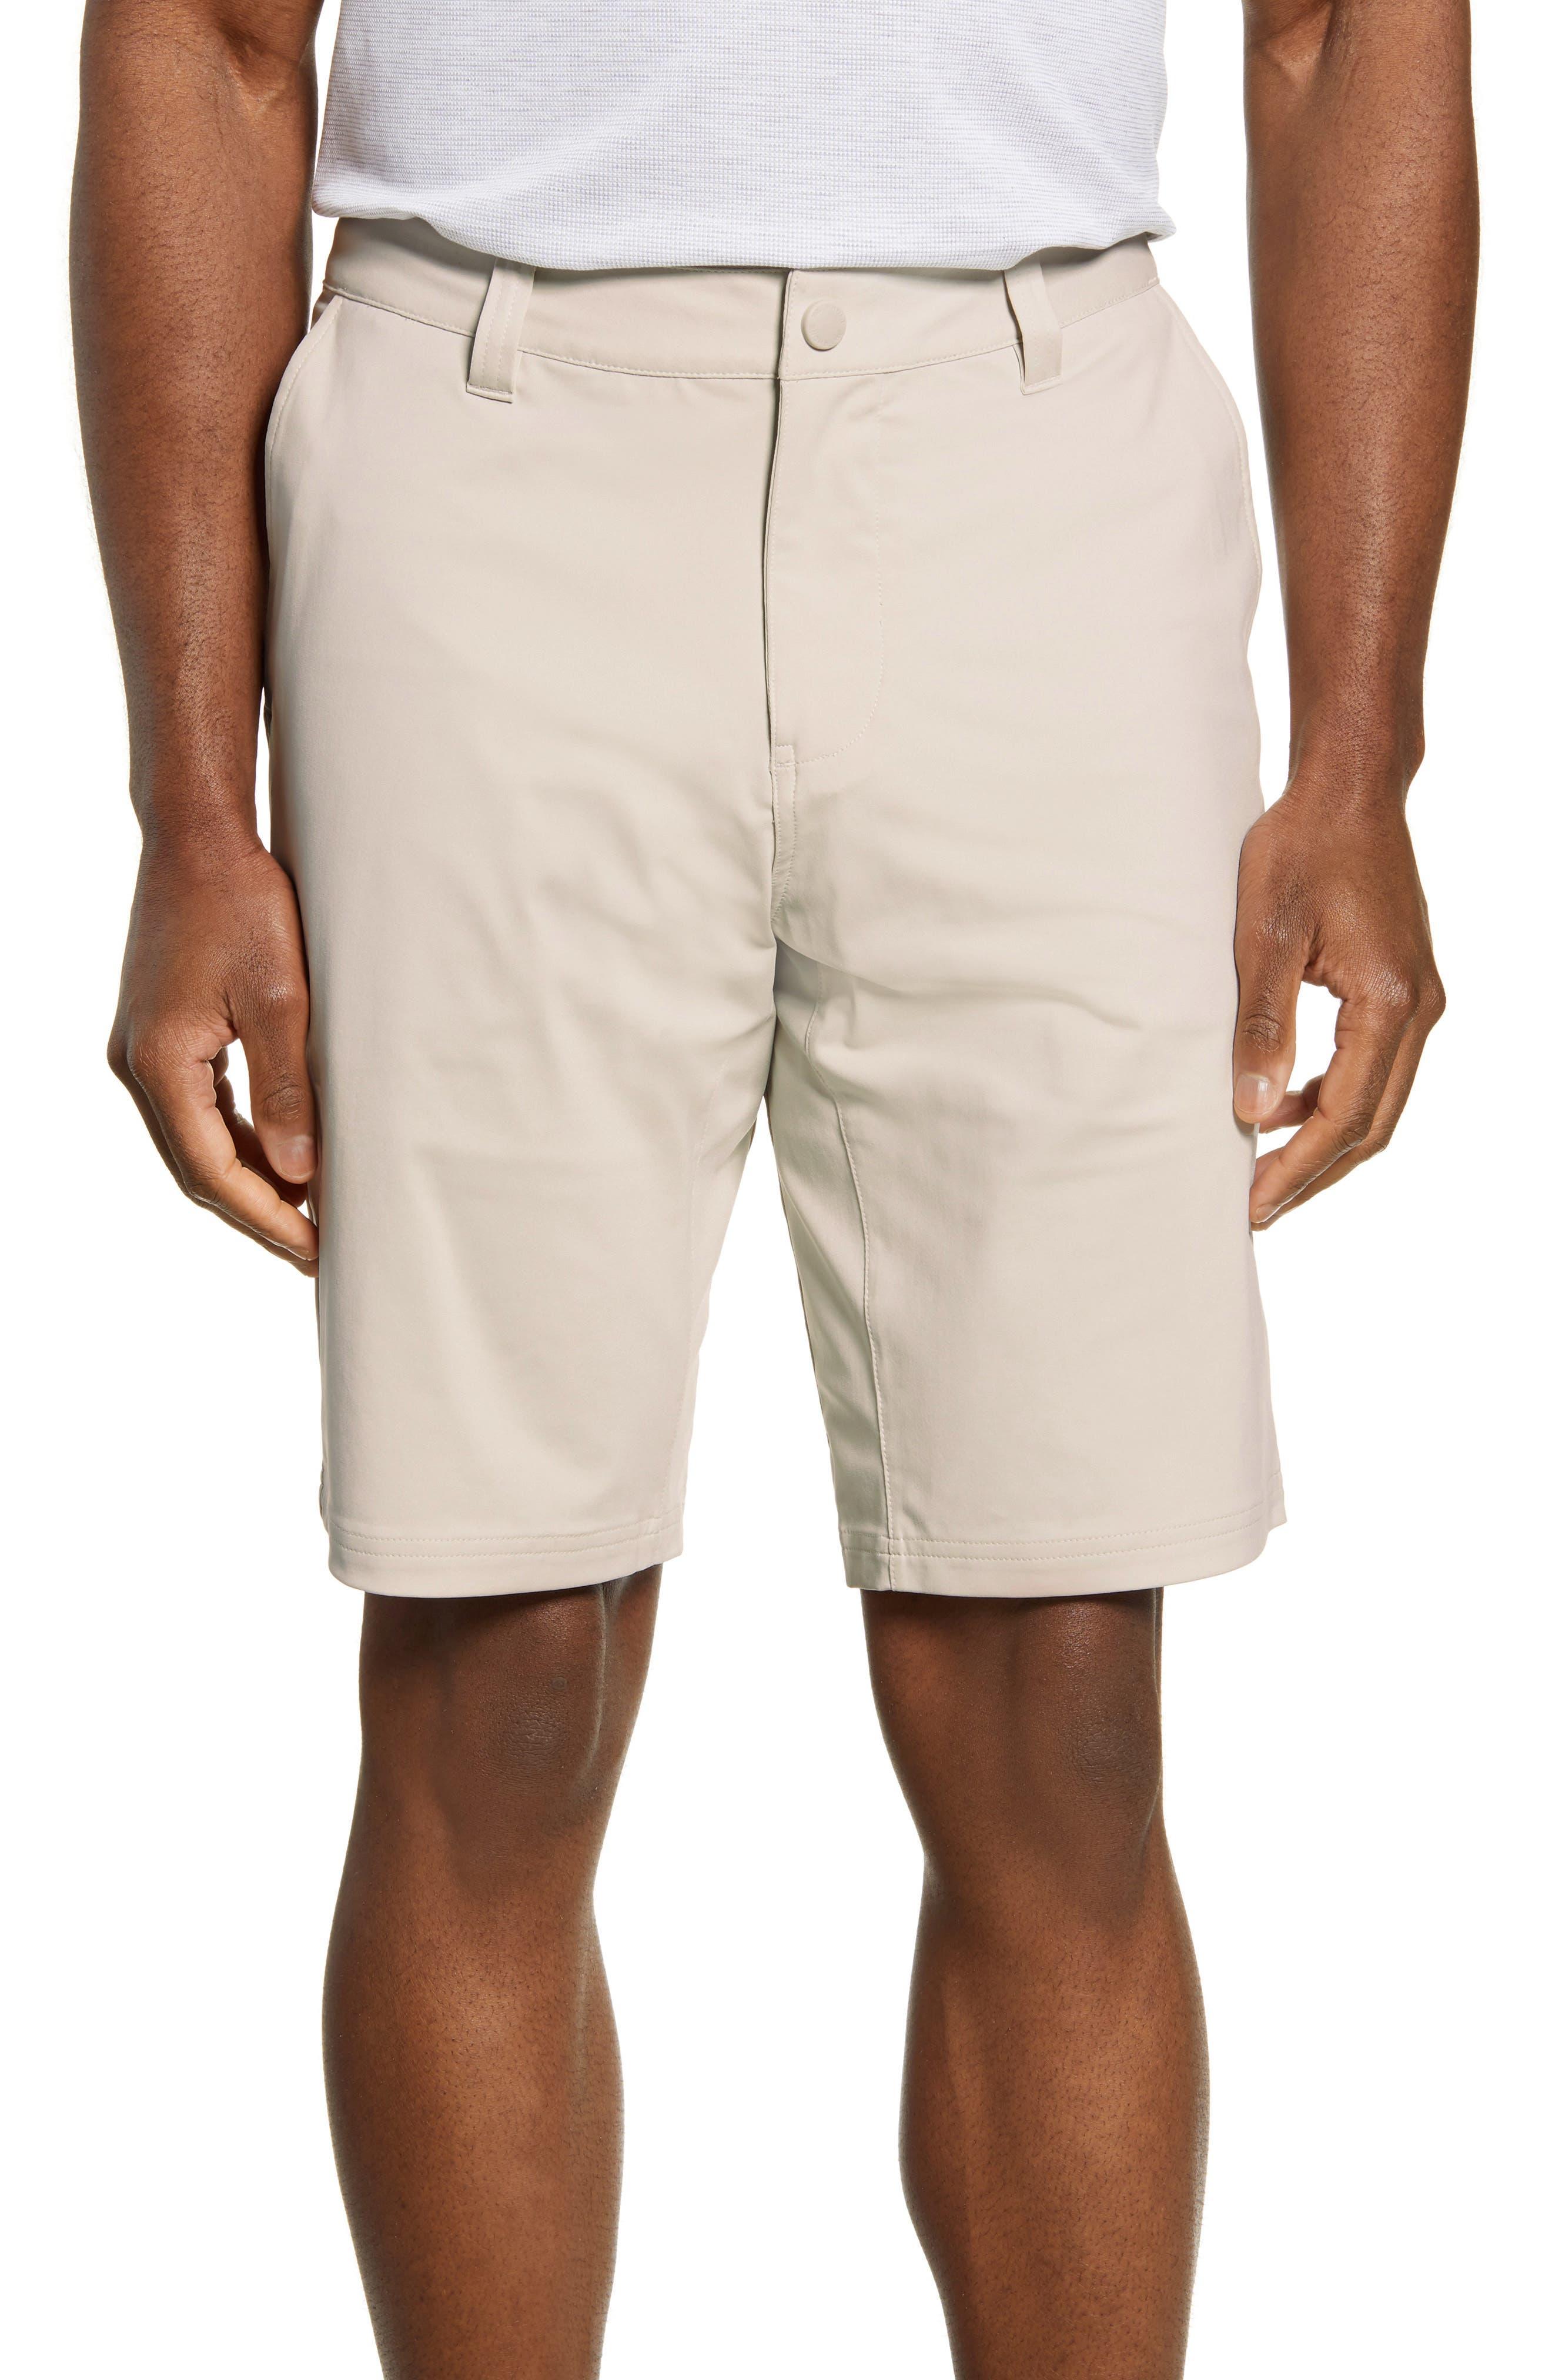 Men's Rhone Commuter Solid Performance Shorts